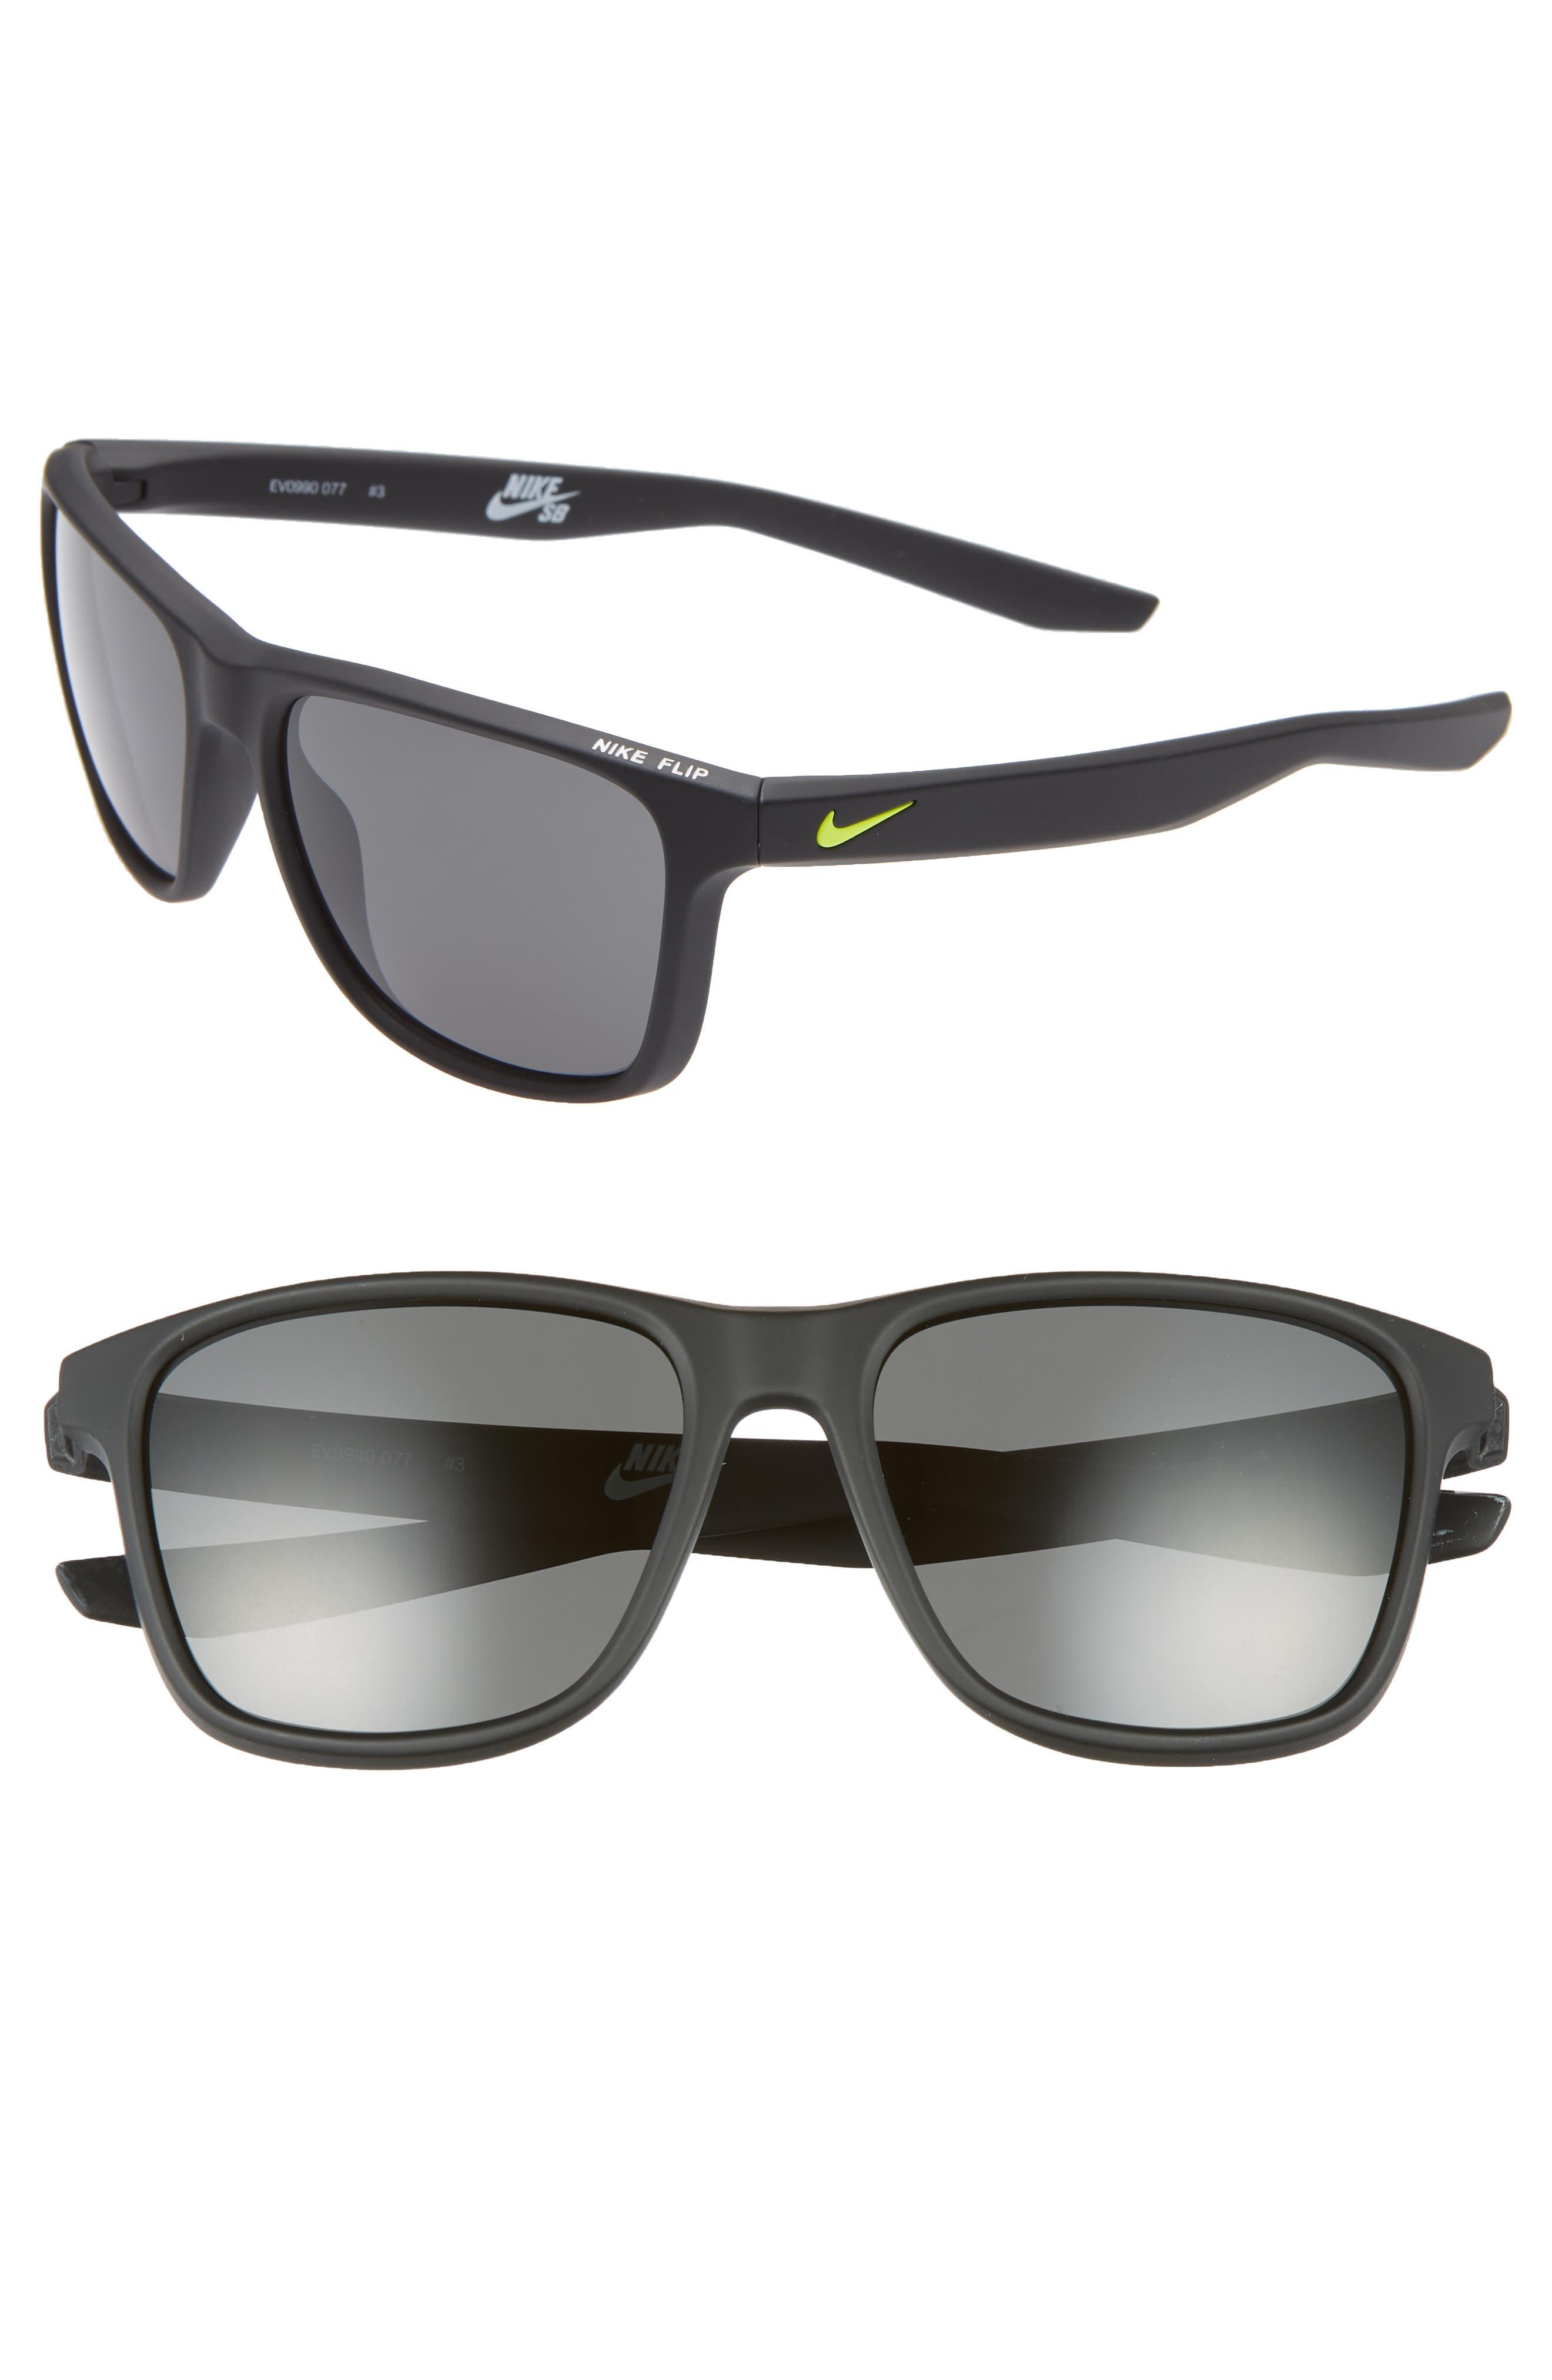 Nike Flip 5m Mirrored Sunglasses - Matte Black/ Grey